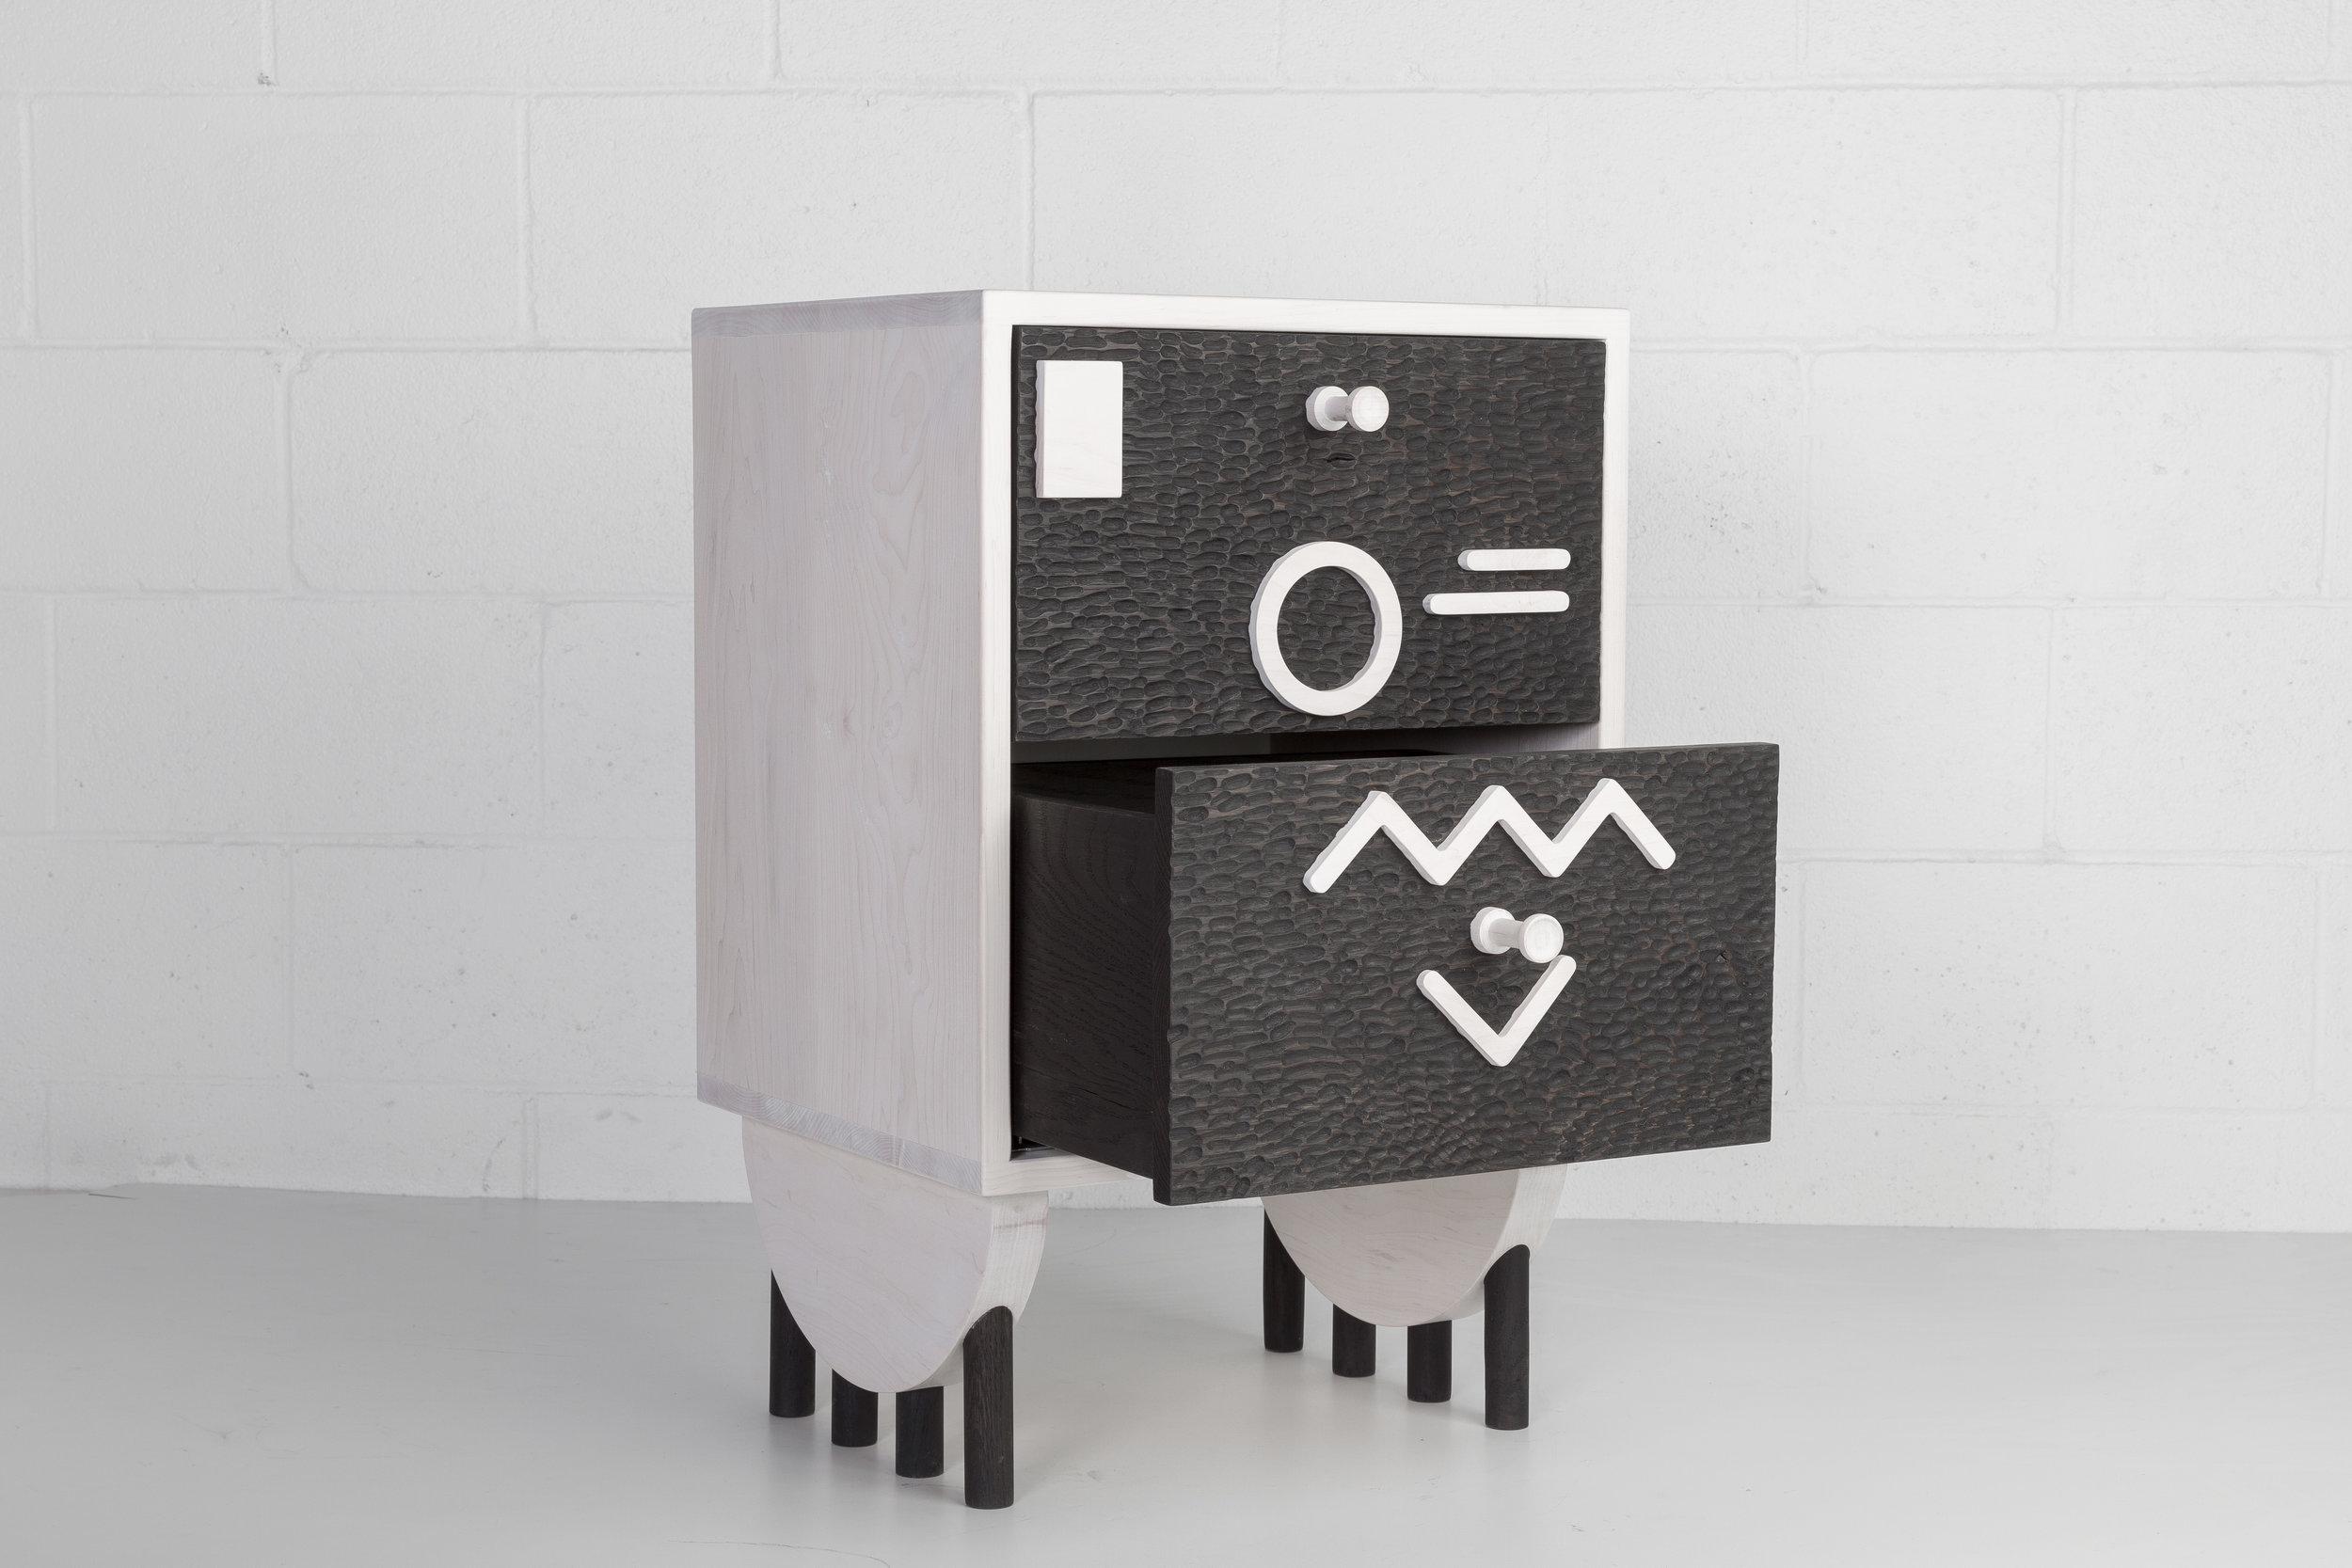 cabinets-7.jpg